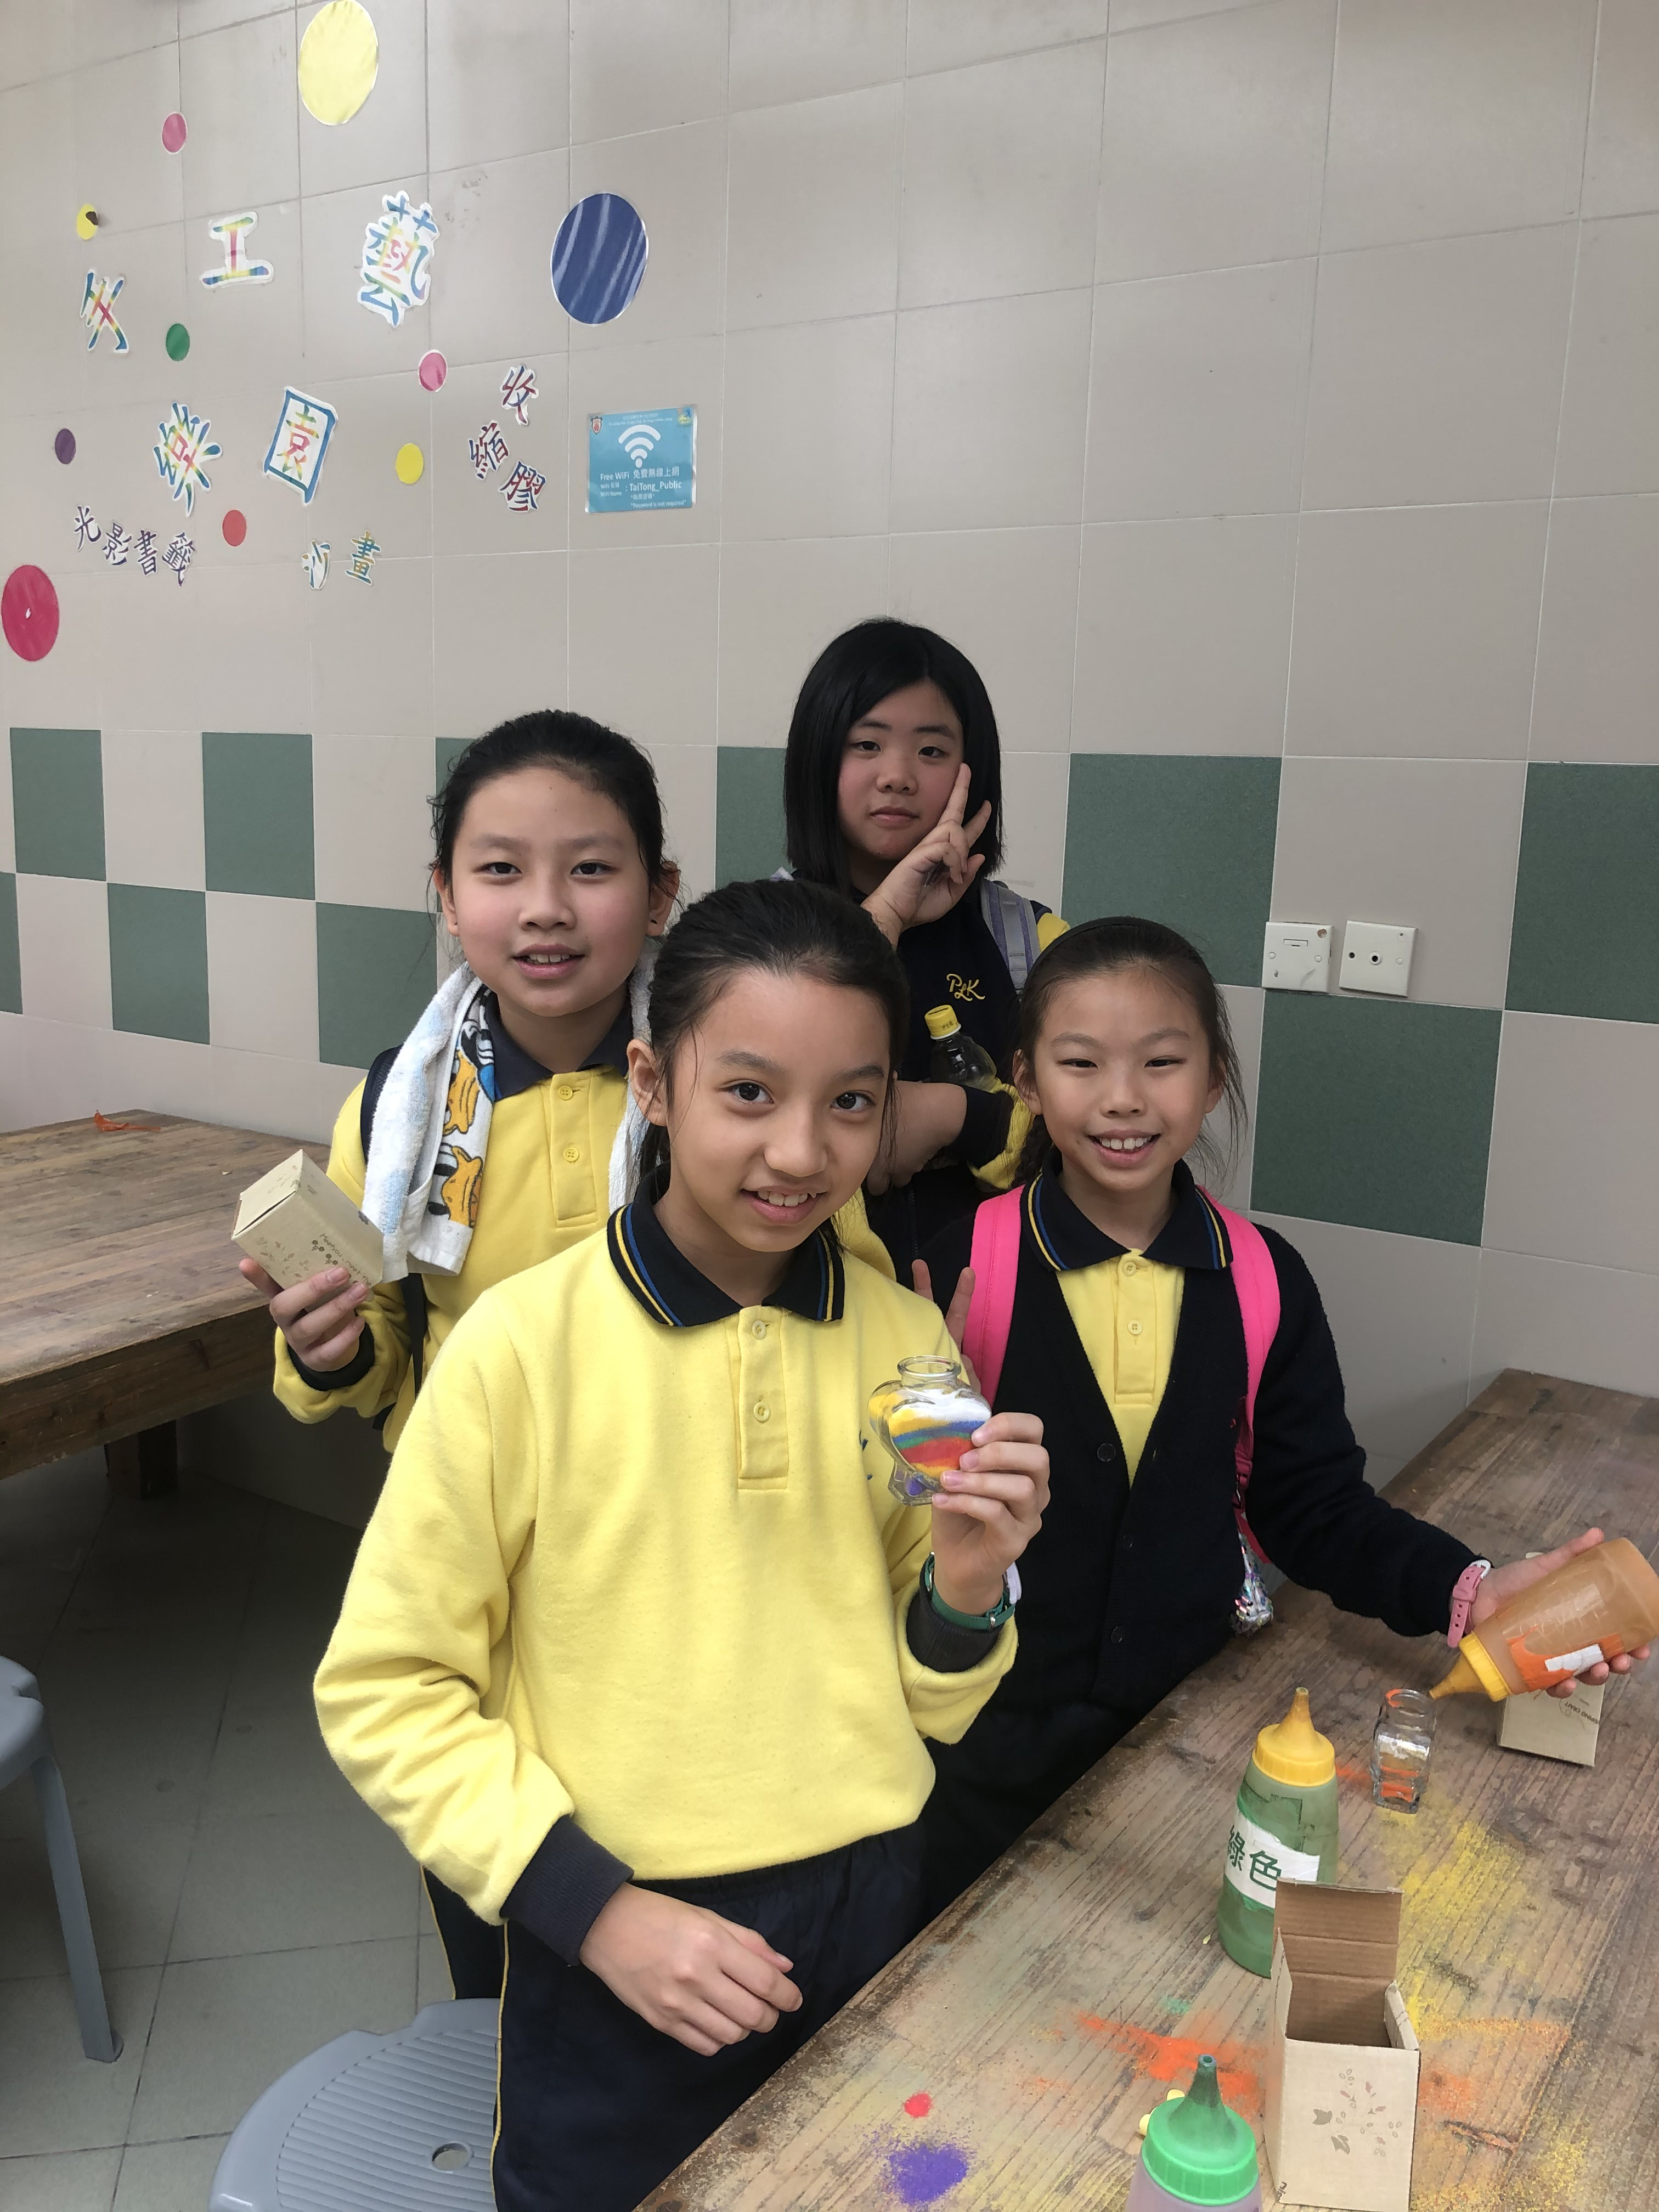 https://plkcjy.edu.hk/sites/default/files/xuan_zhuan_img_6225.jpg